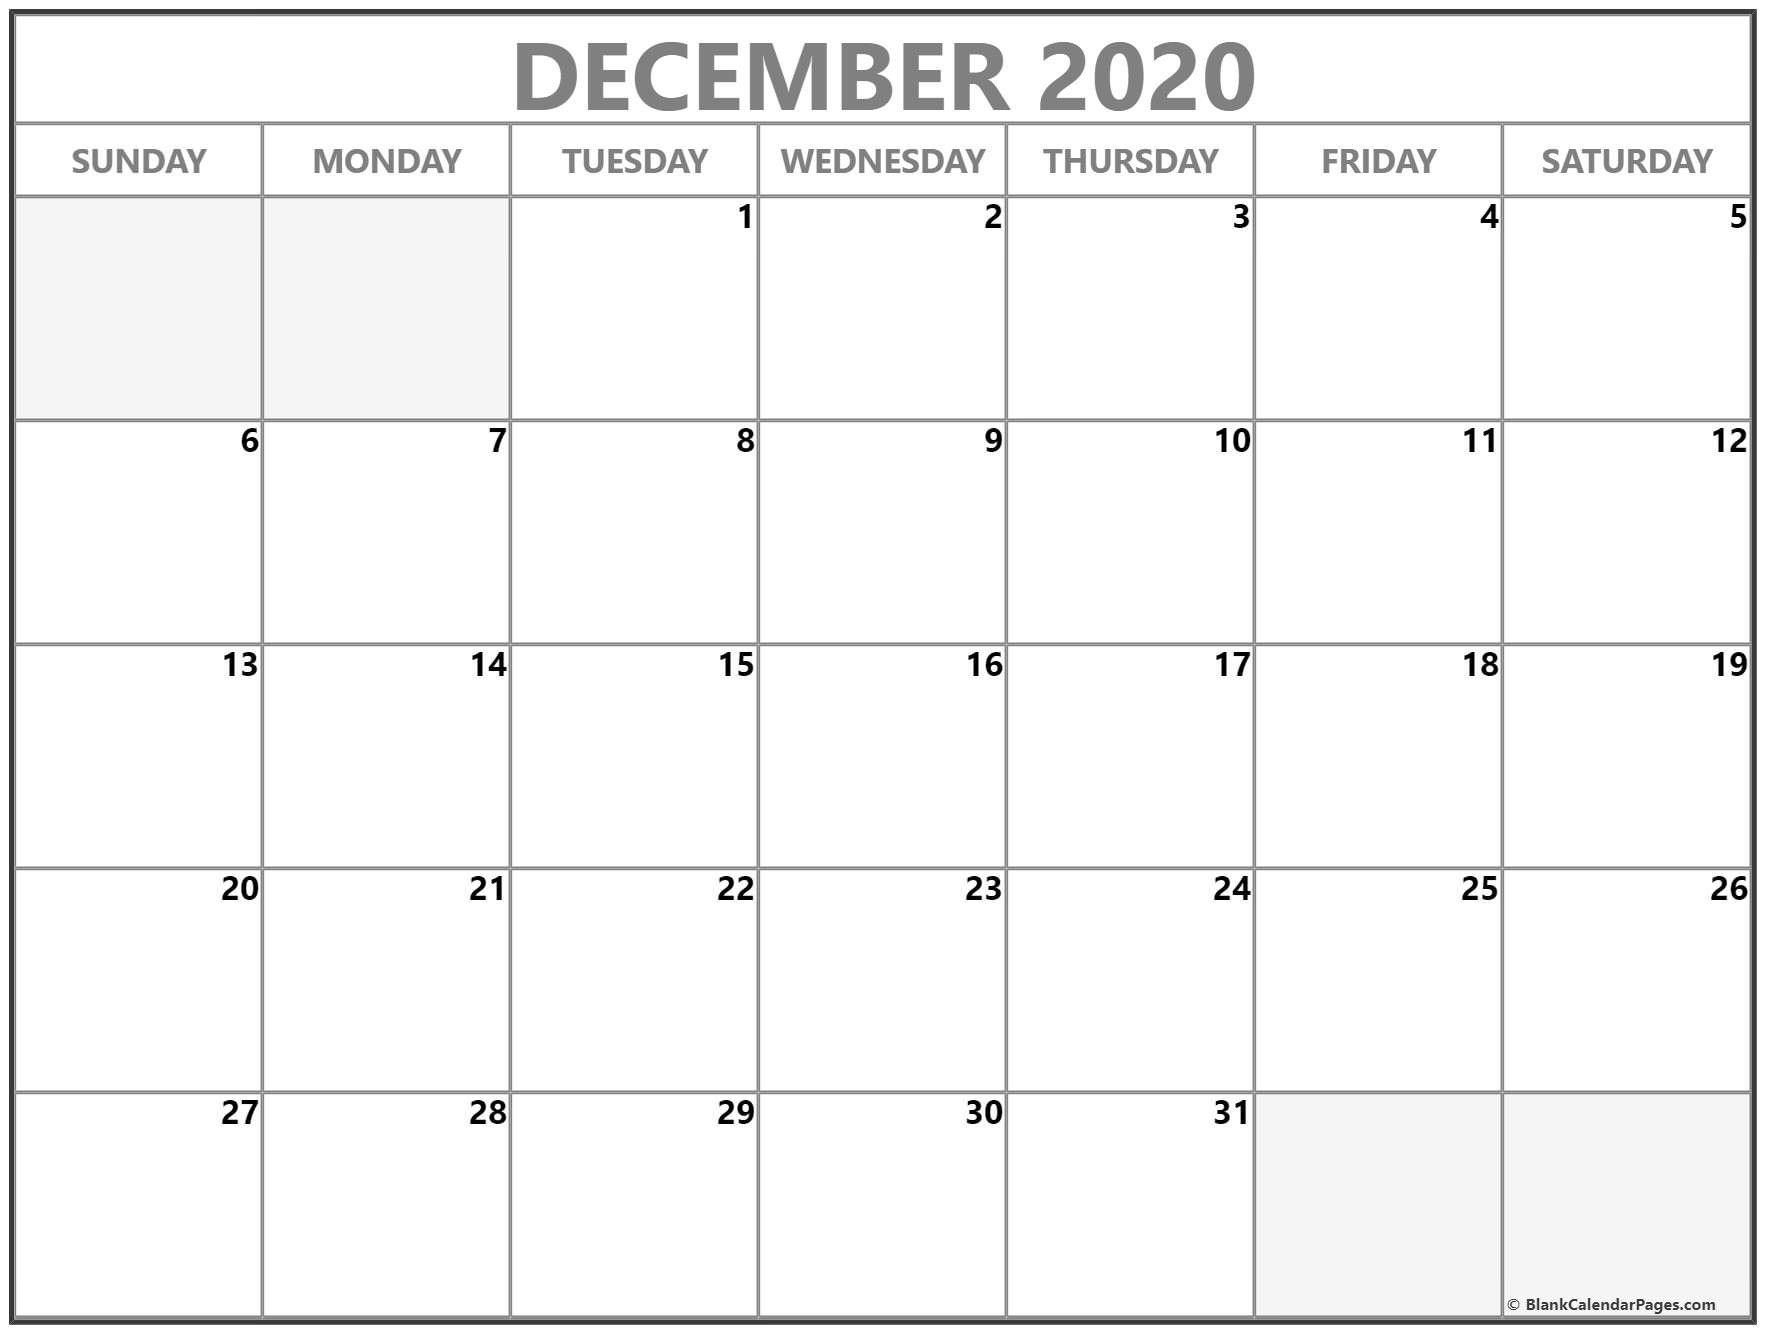 December 2020 Calendar Free Printable Monthly Calendars December 2020 Print Free Calendar D Calendar Printables Blank Calendar Pages Monthly Calendar Printable